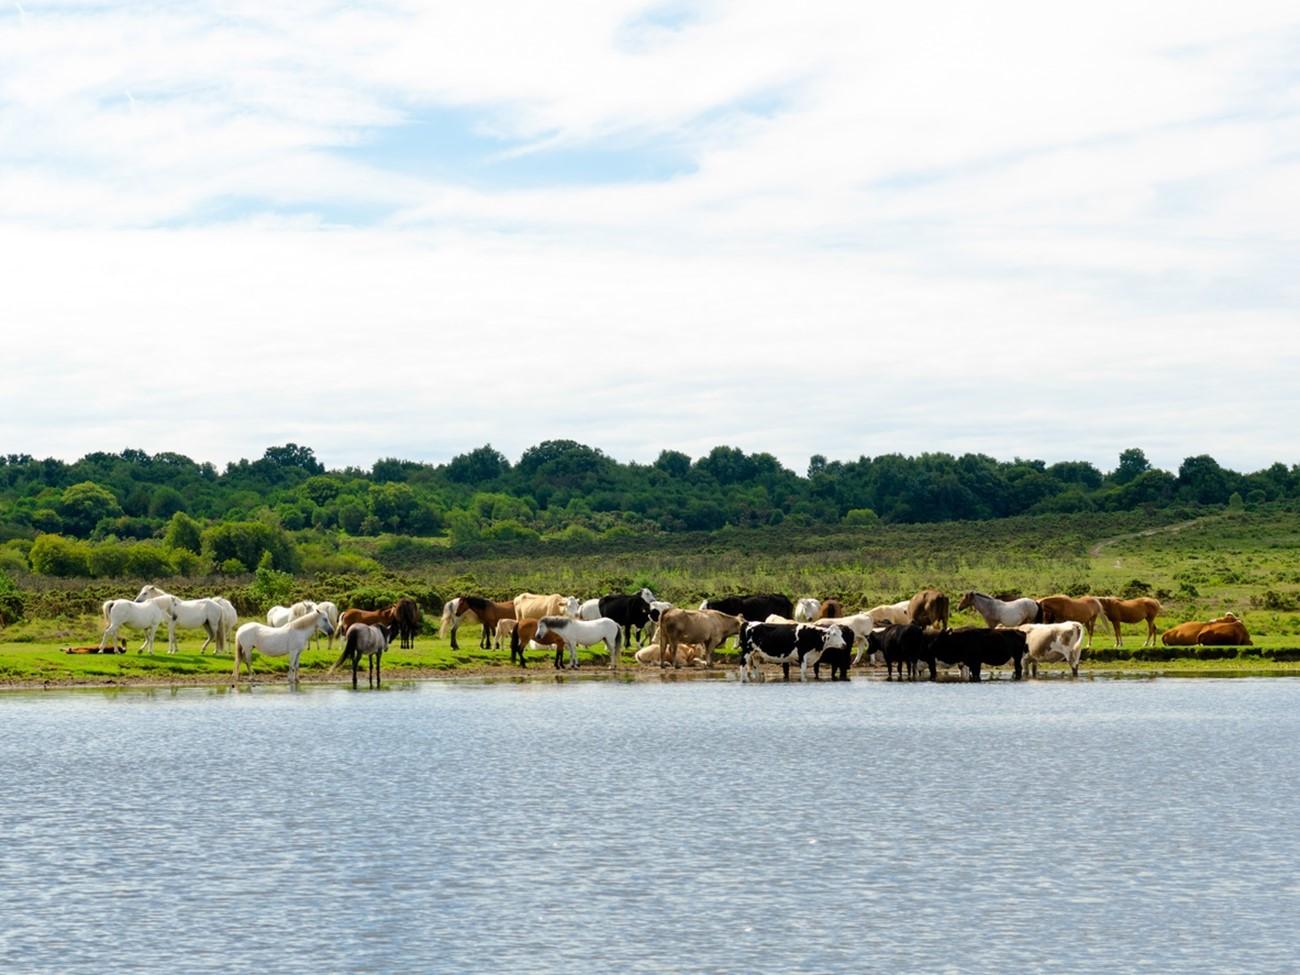 iStock-519434364 - horses, cows.jpg